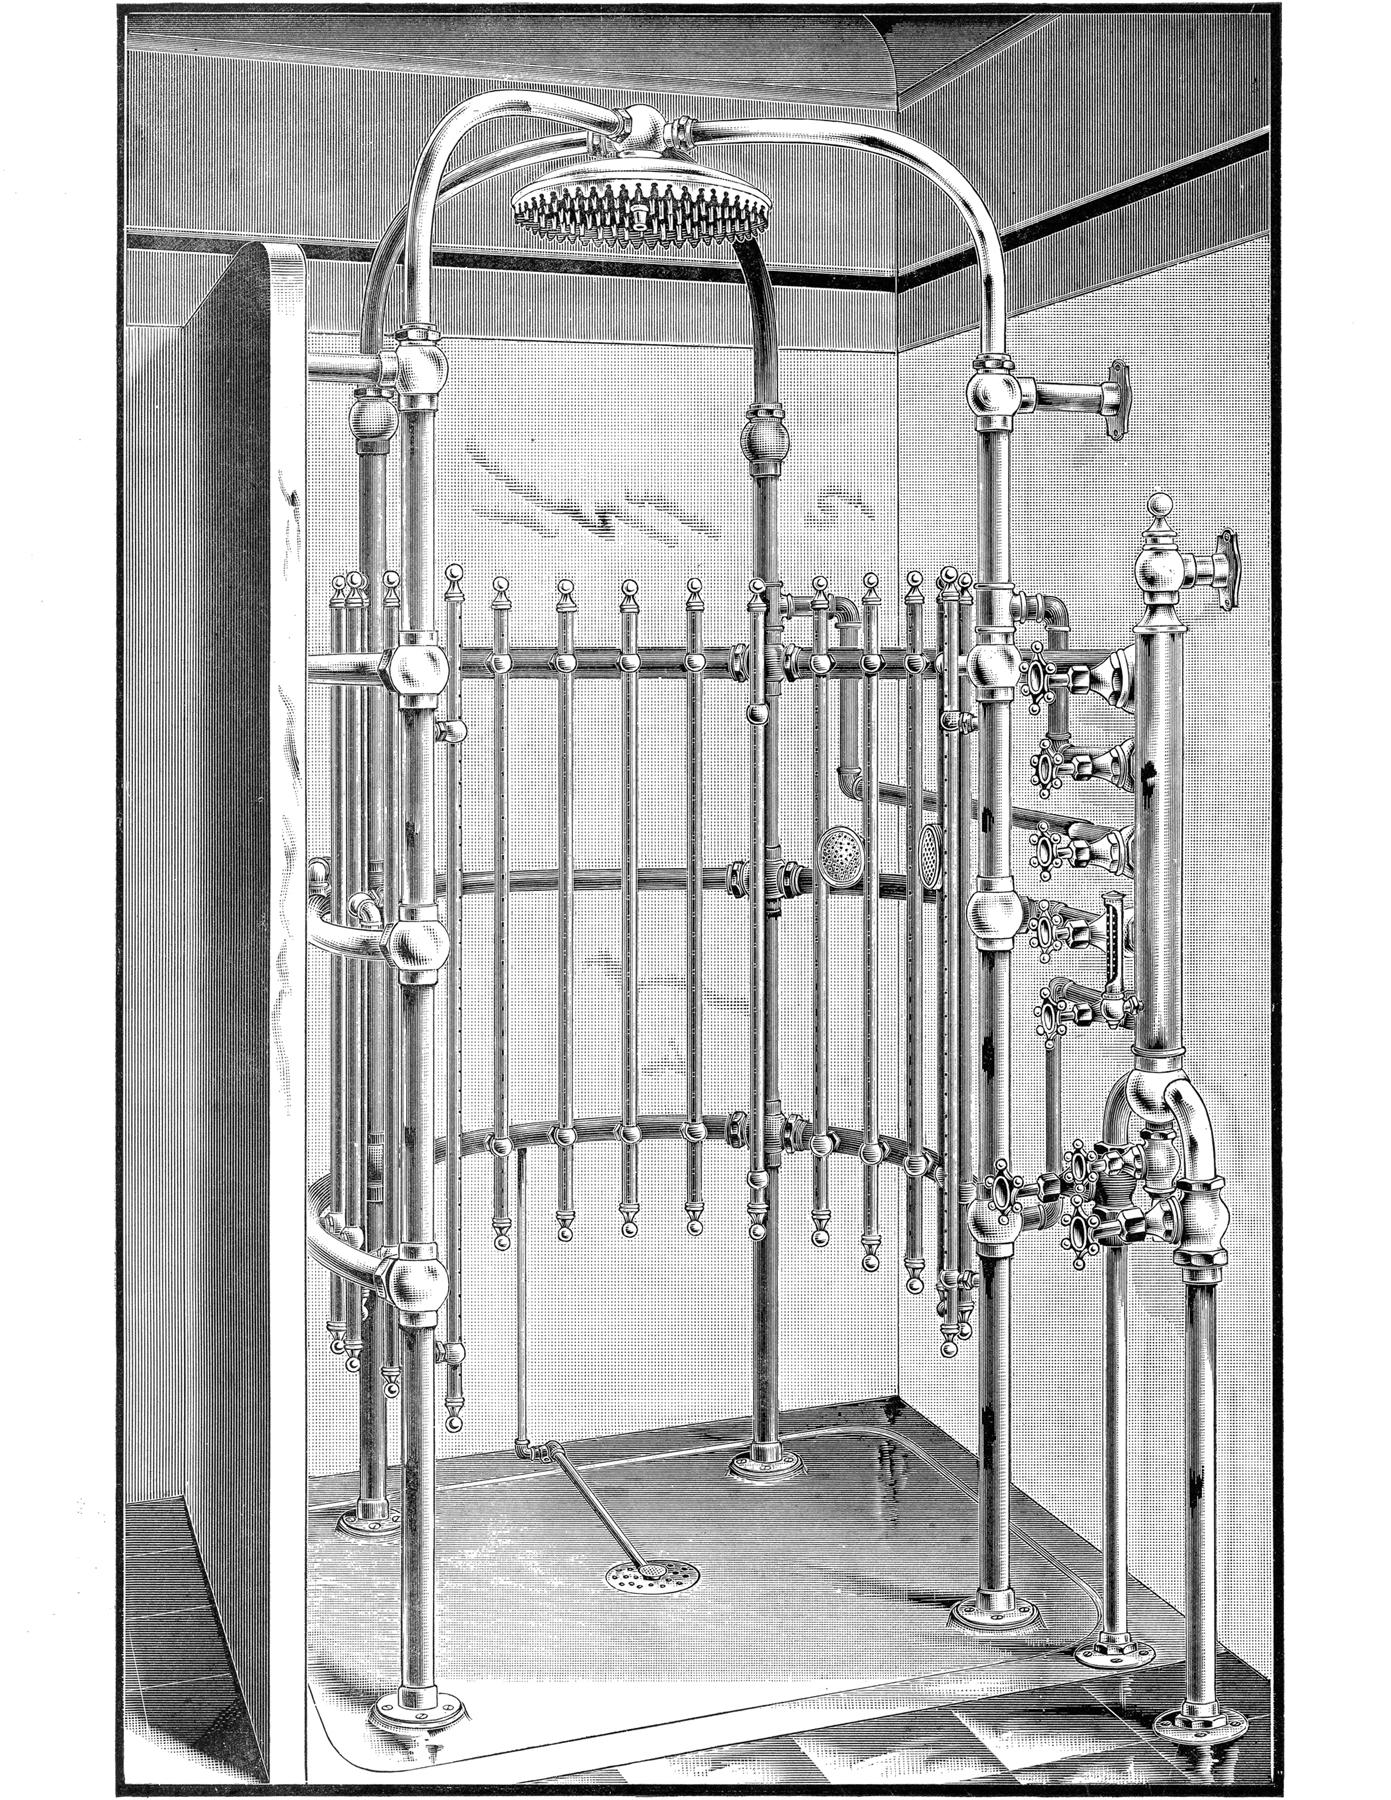 Curious Antique Shower Image The Graphics Fairy